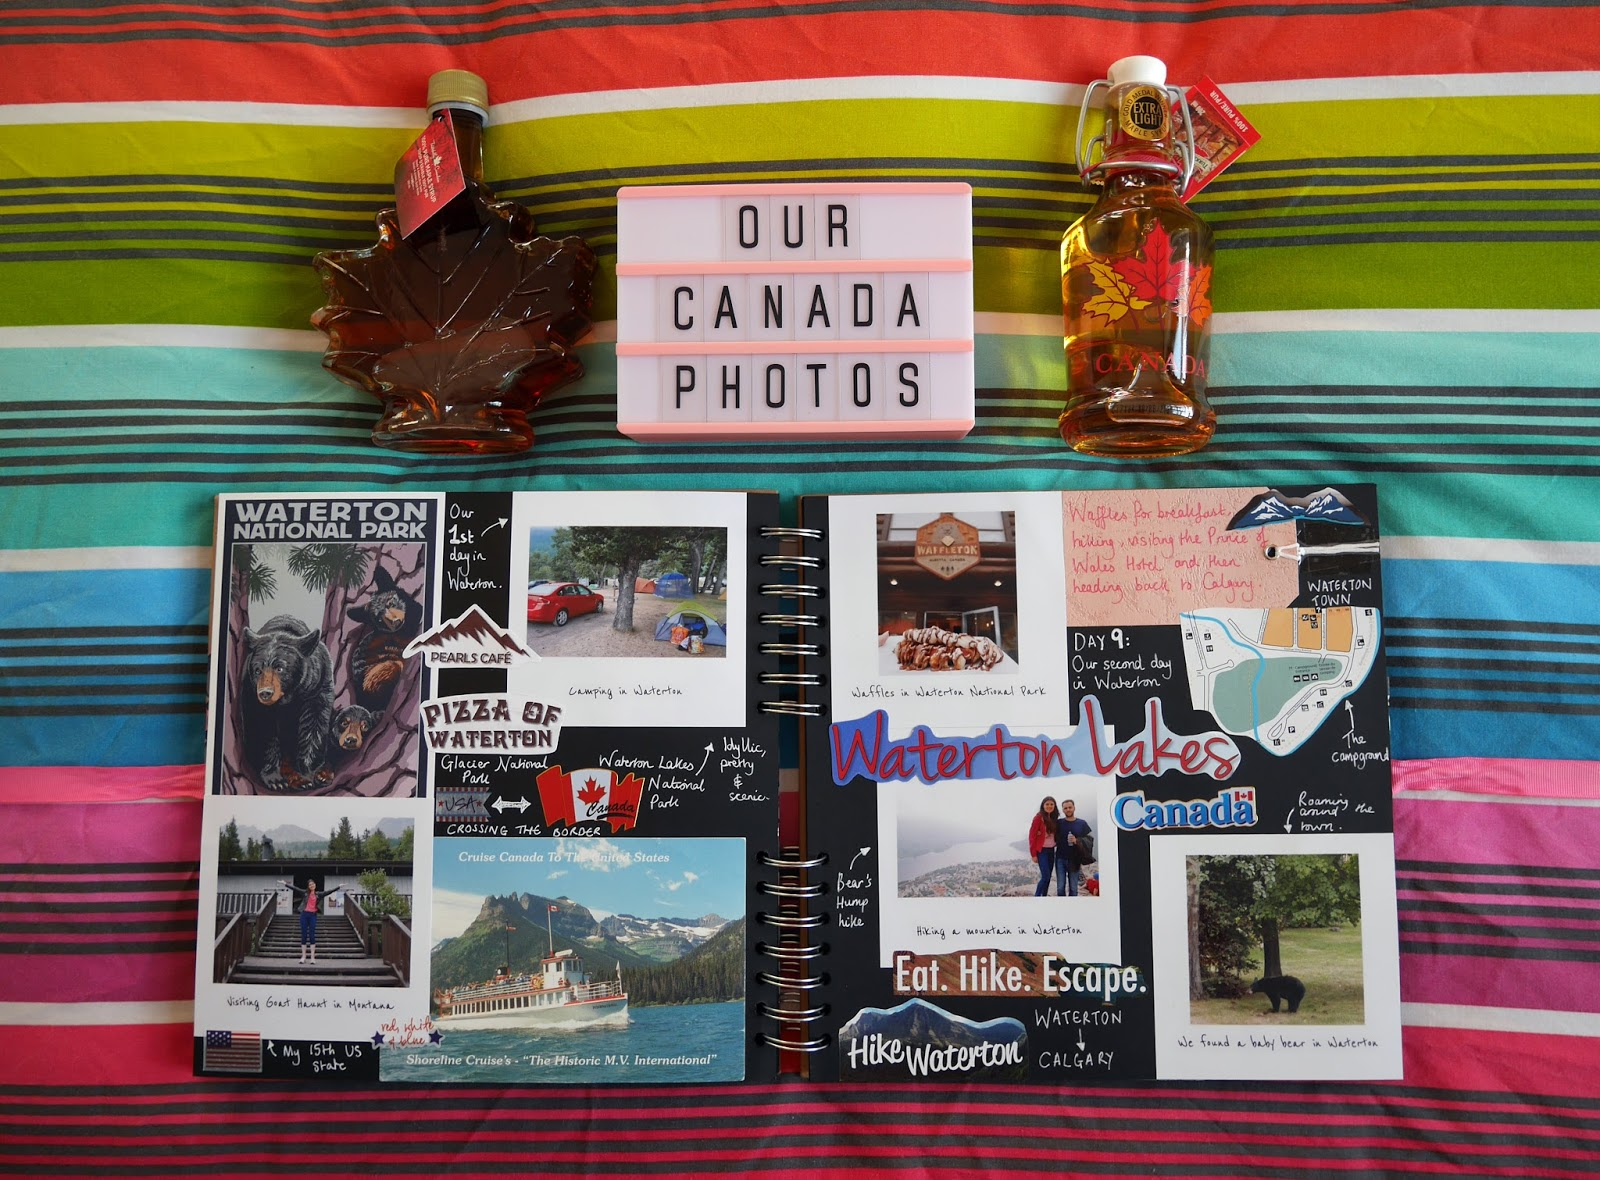 Canada travel scrapbook pages 11-12 (Waterton Lakes National Park) featuring Printiki's retro prints